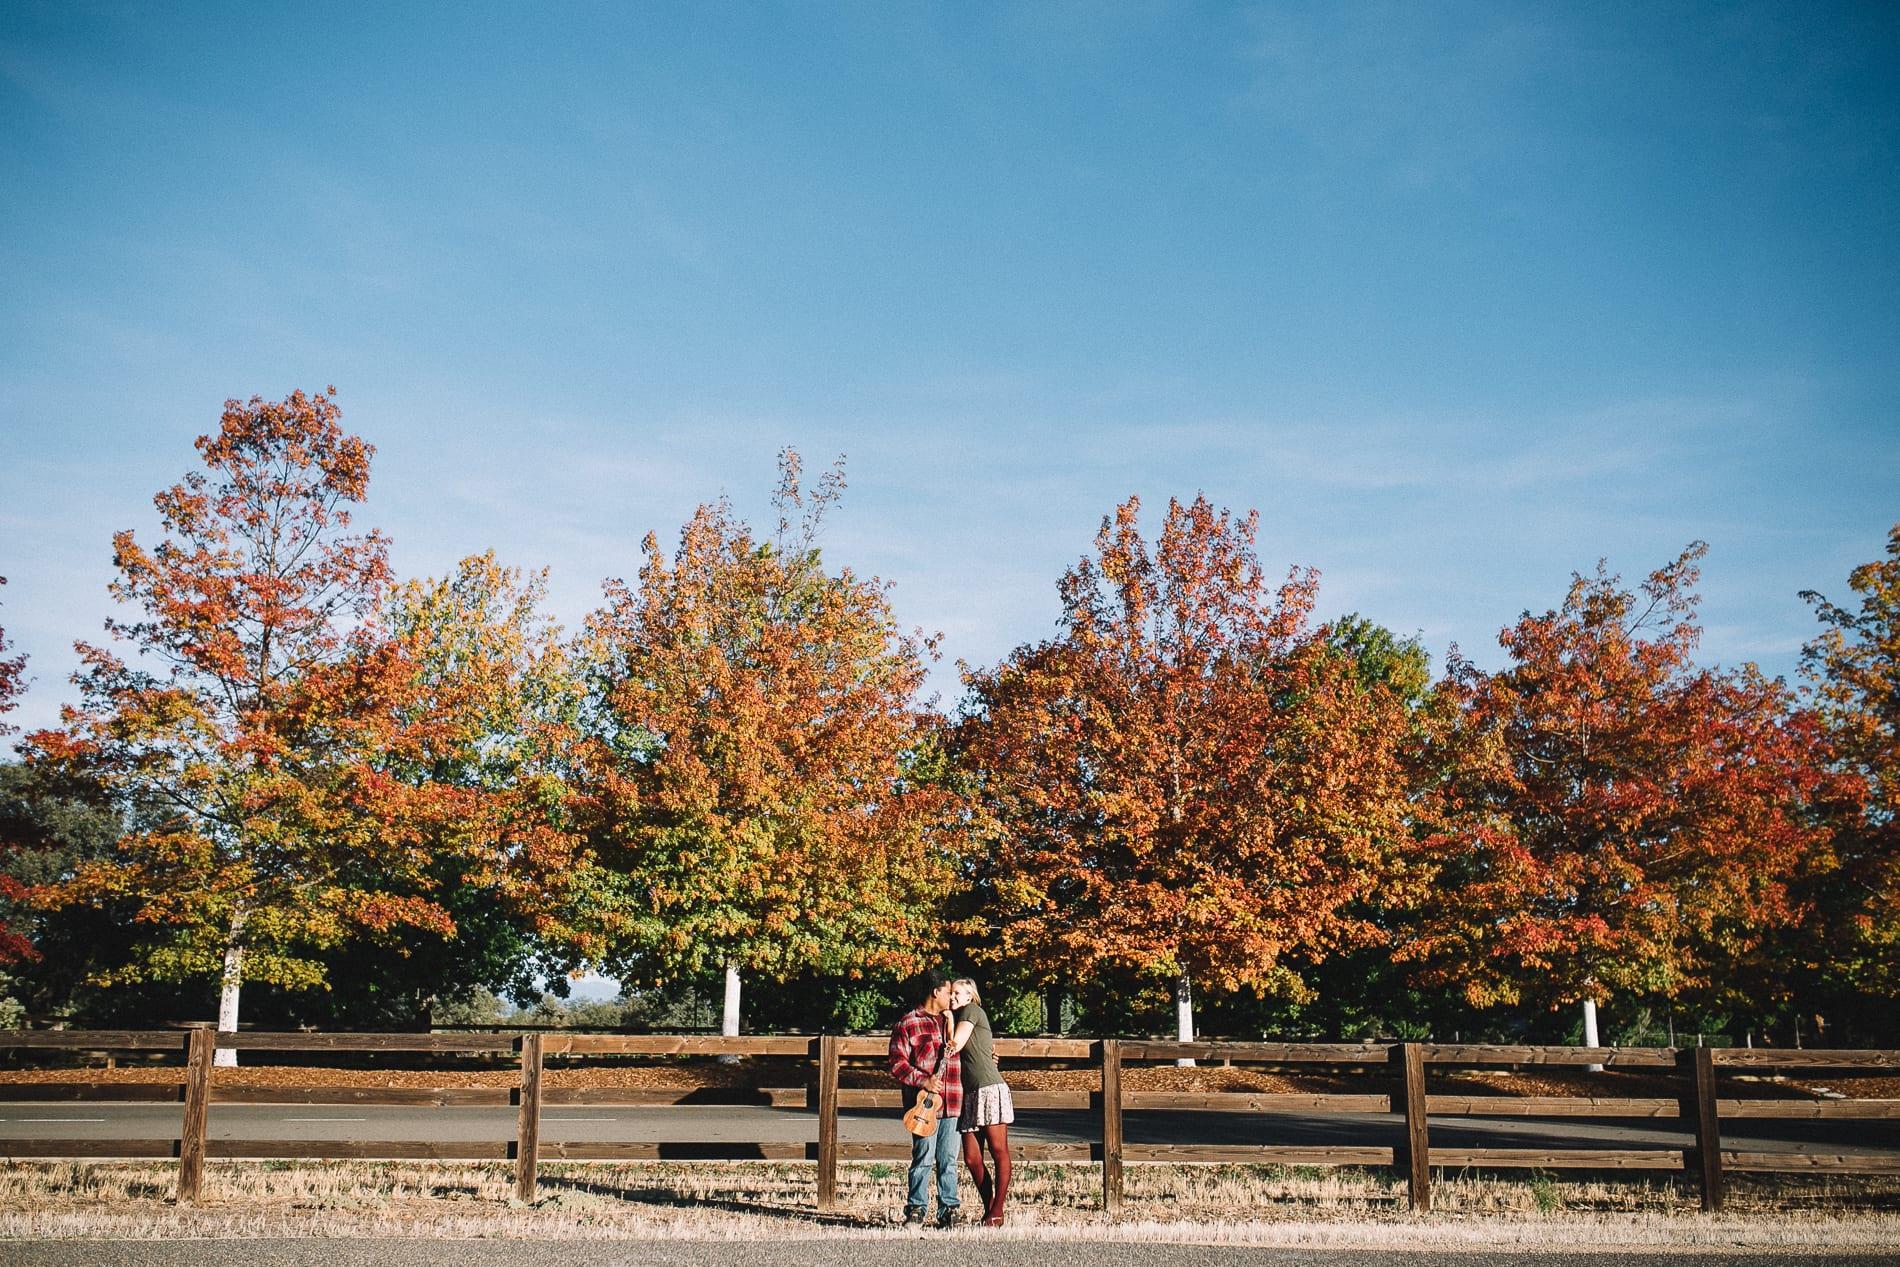 redding-lema-ranch-engagement-photo-7